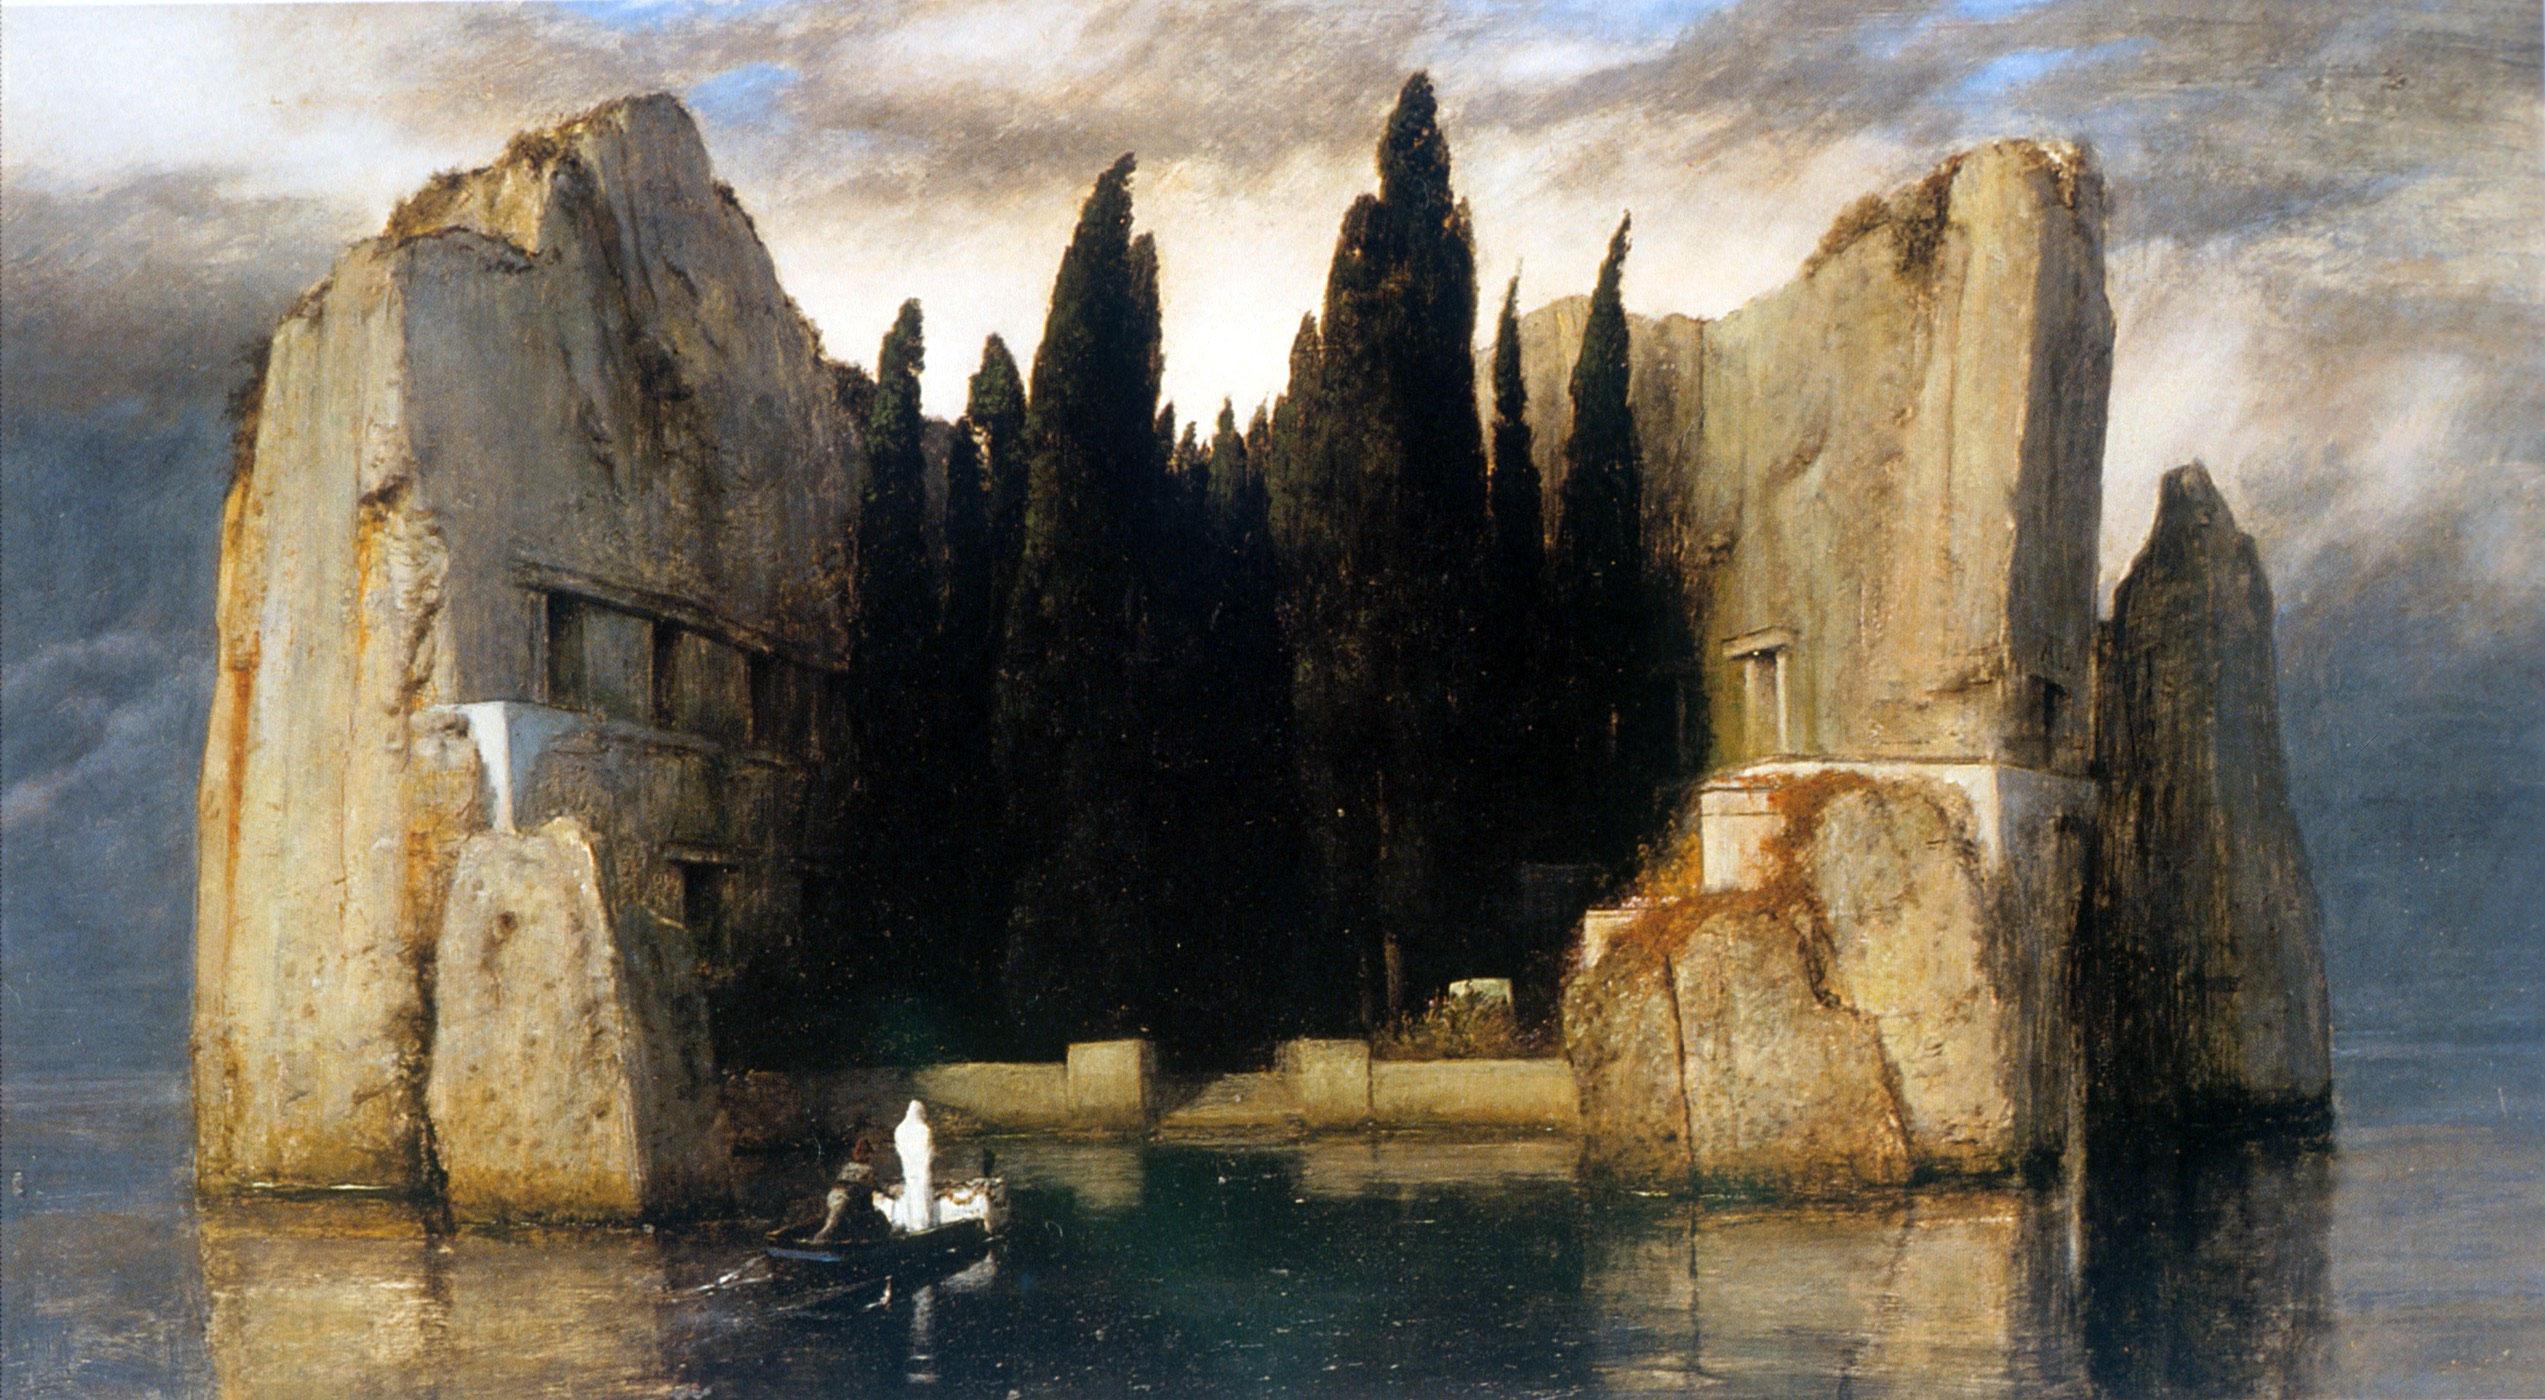 Arnold_Boecklin_-_Island_of_the_Dead,_Third_Version-min